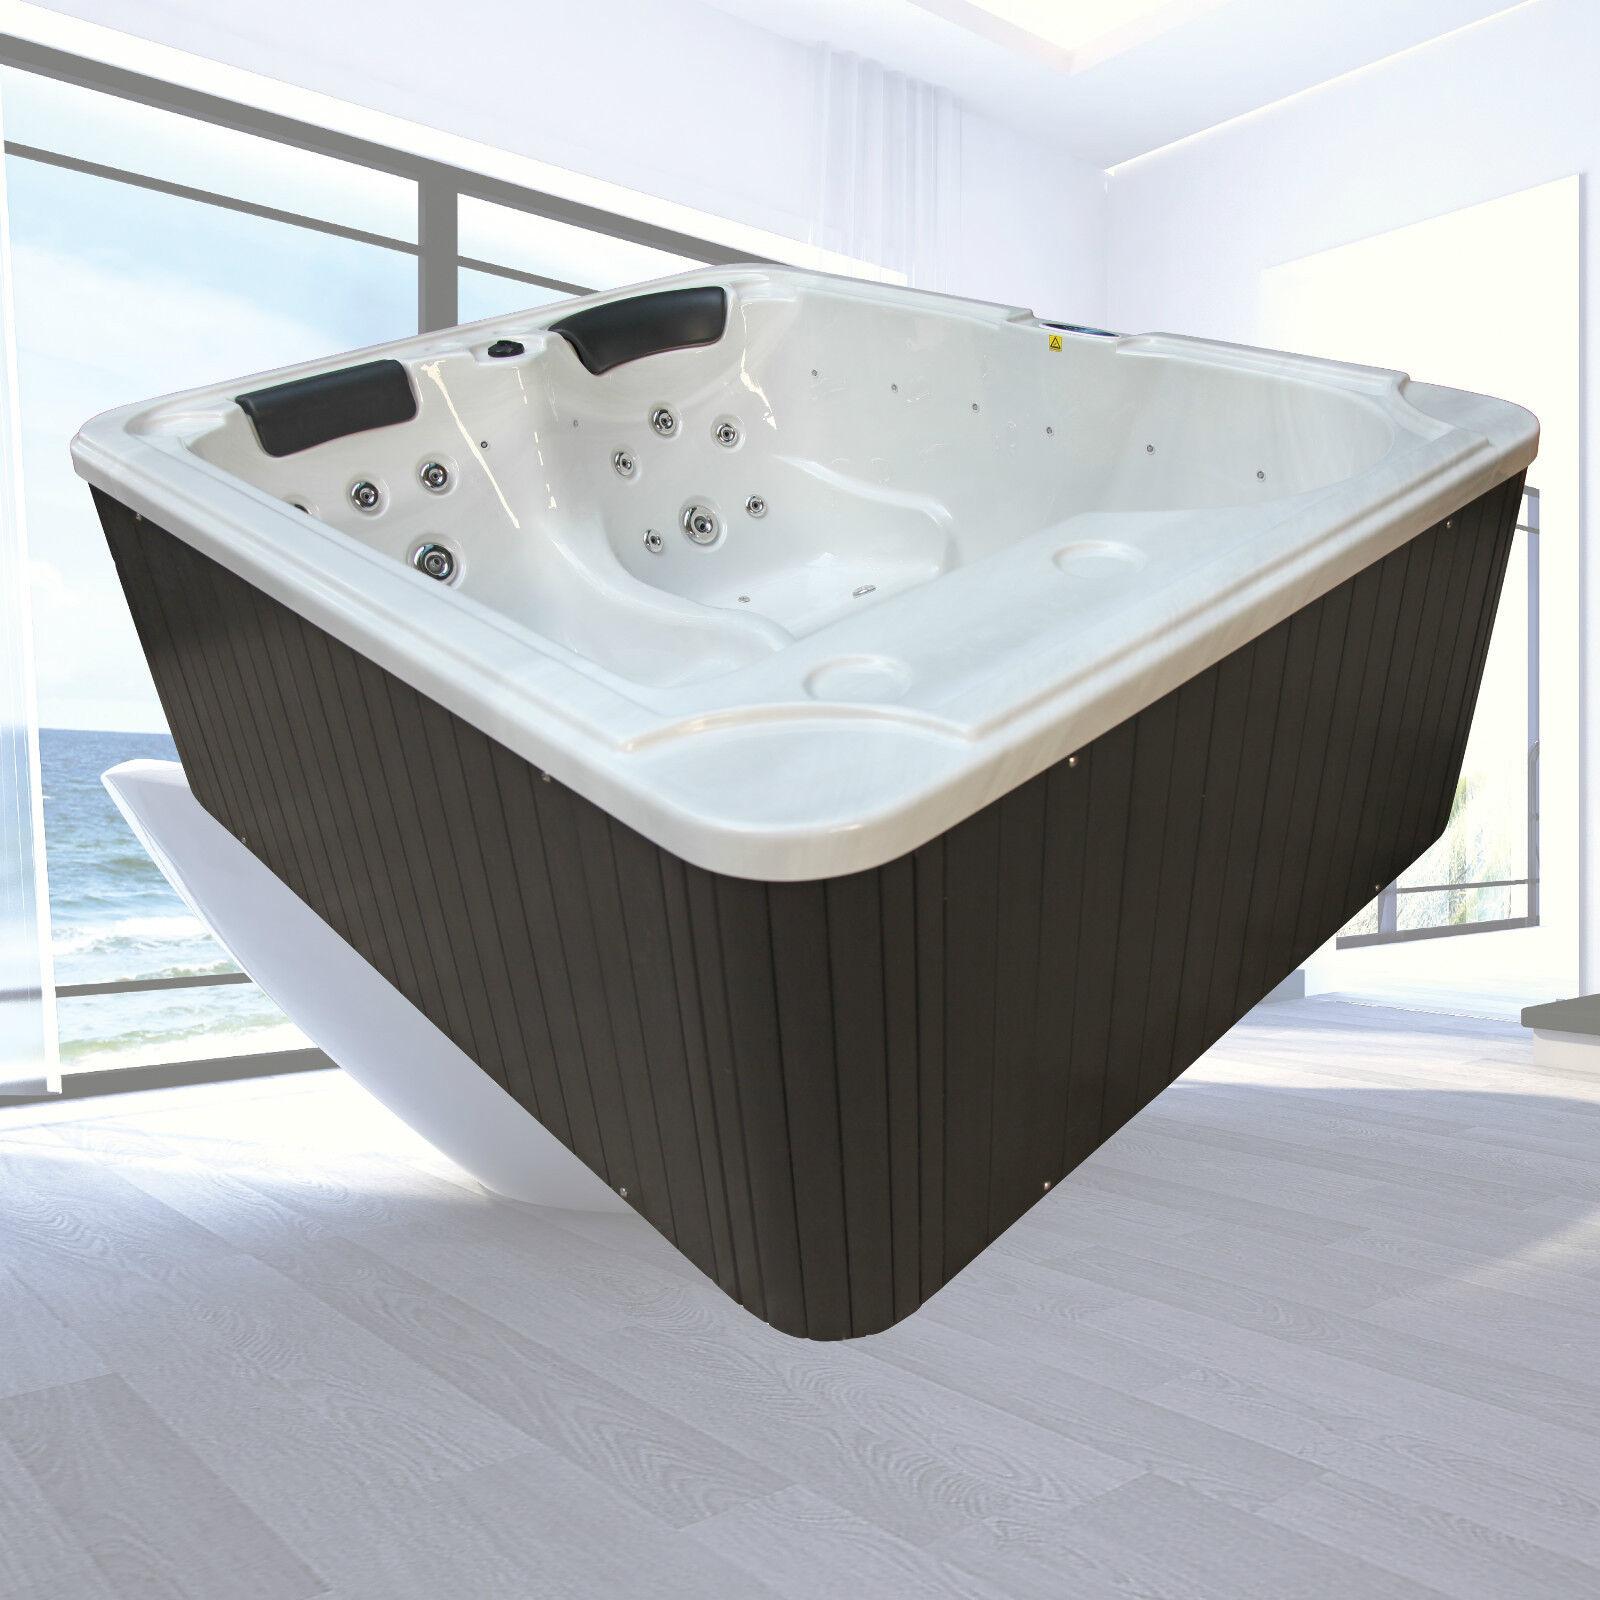 perfect spa whirlpool outdoorindoor long beach 23p hot